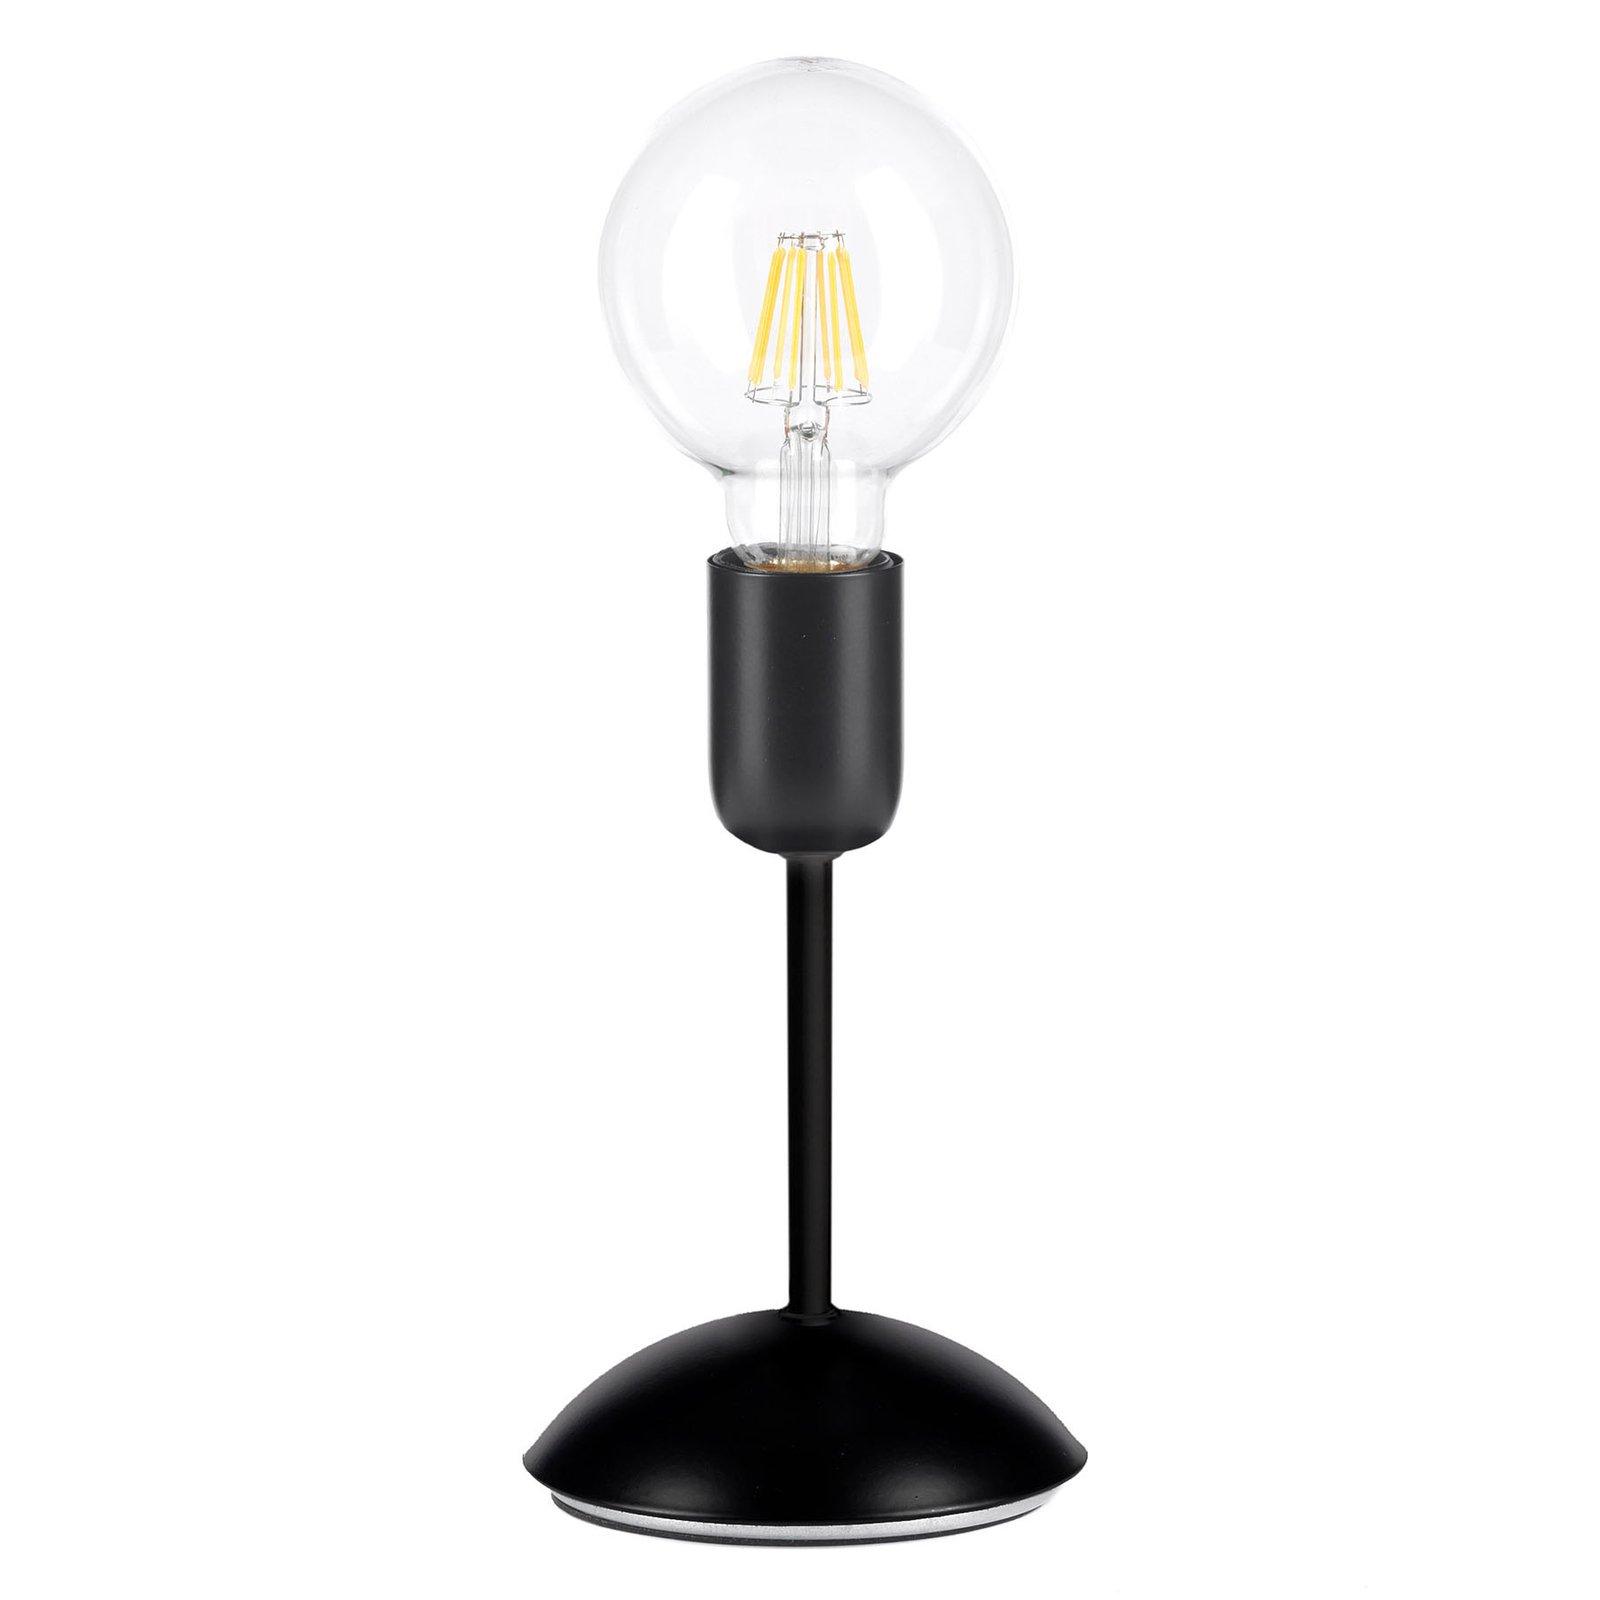 Bordlampe Mantis i svart, 1 lyskilde